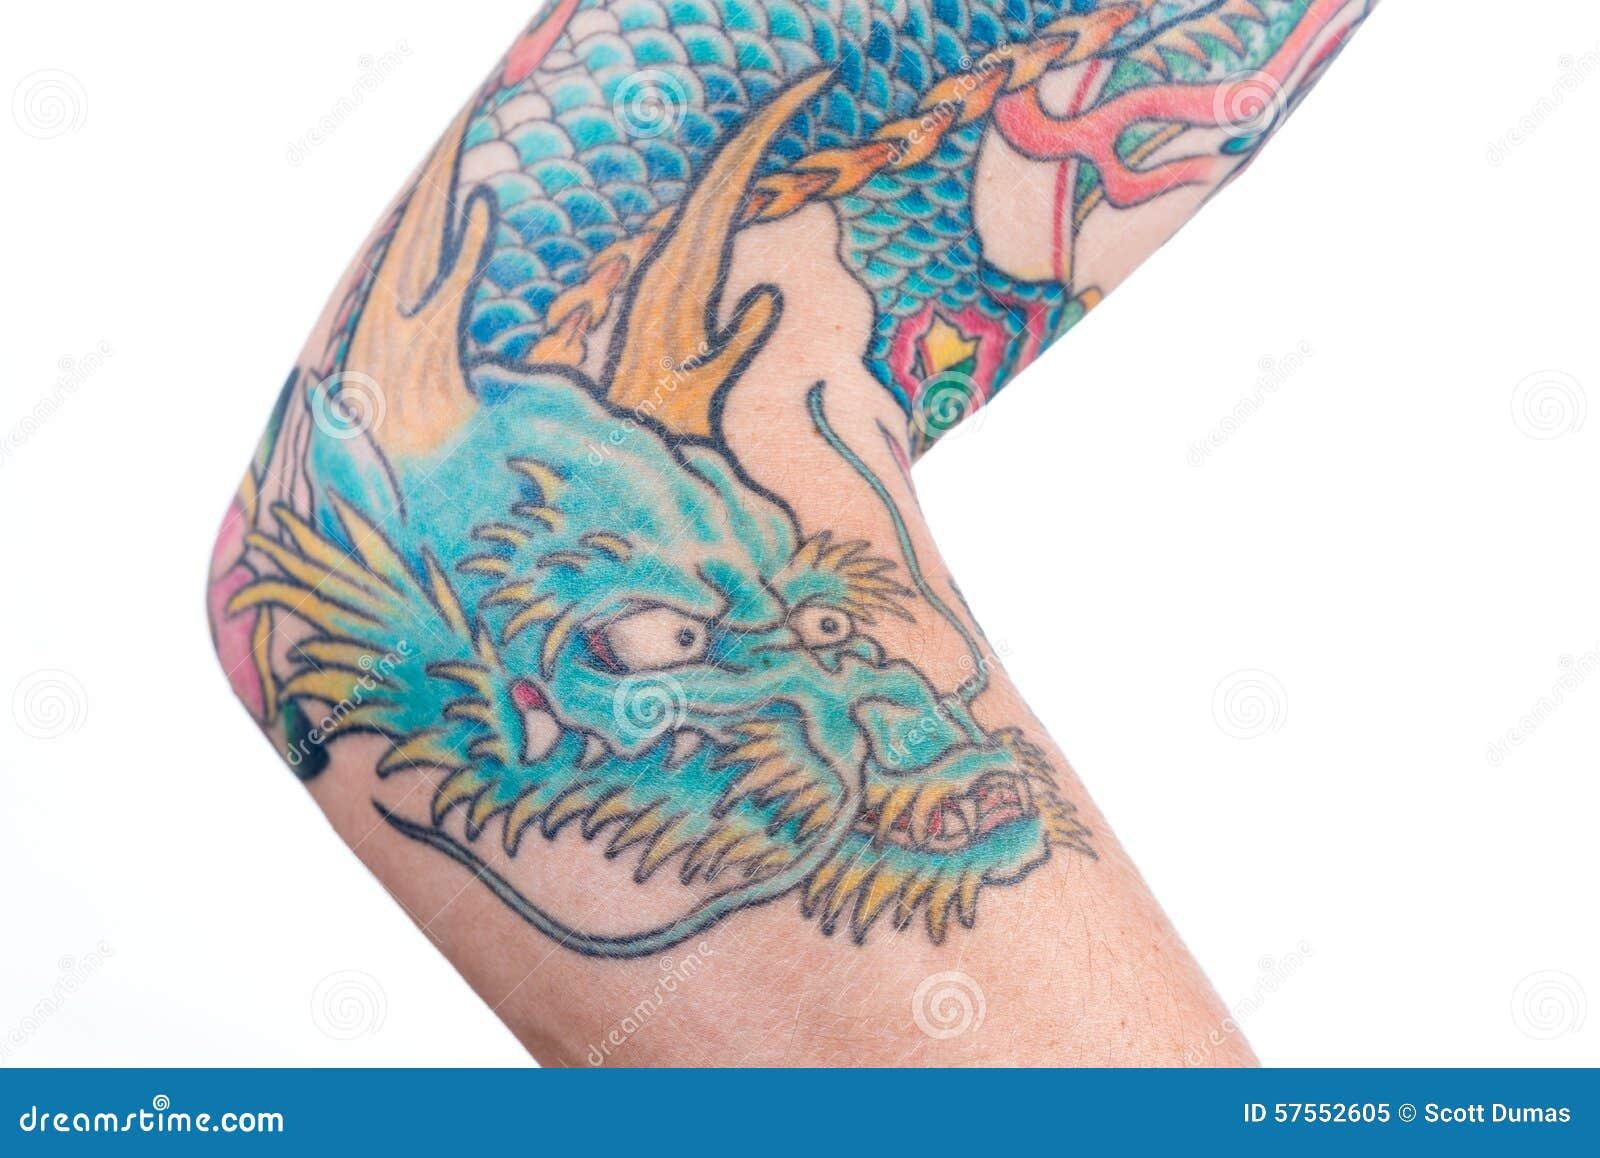 Cabezas De Dragones Para Tatuar dragon tattoo azul en el brazo imagen de archivo - imagen de